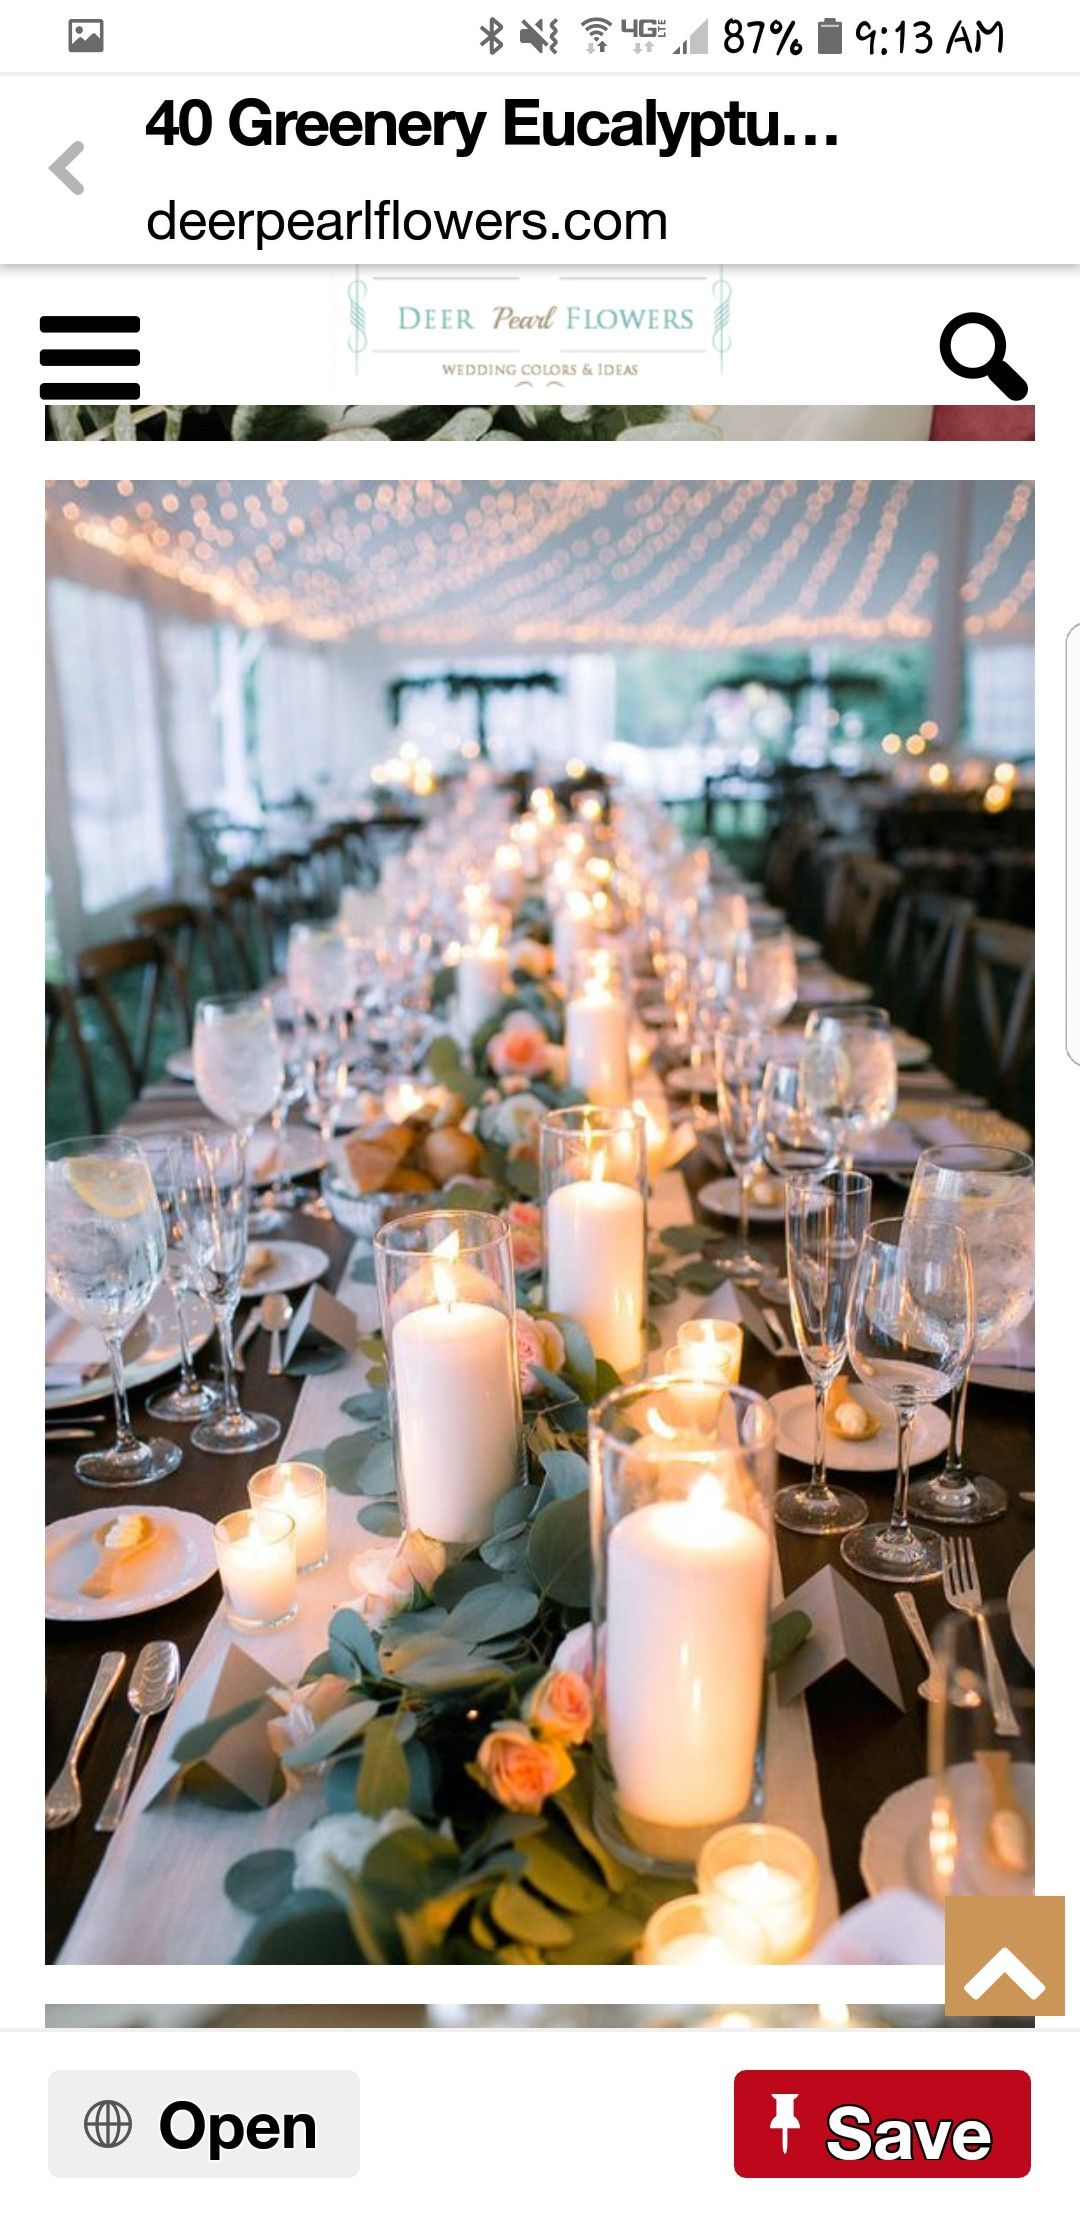 Wedding decorations vintage october 2018 Pin by Sarah Symington on Wedding ideas in   Pinterest